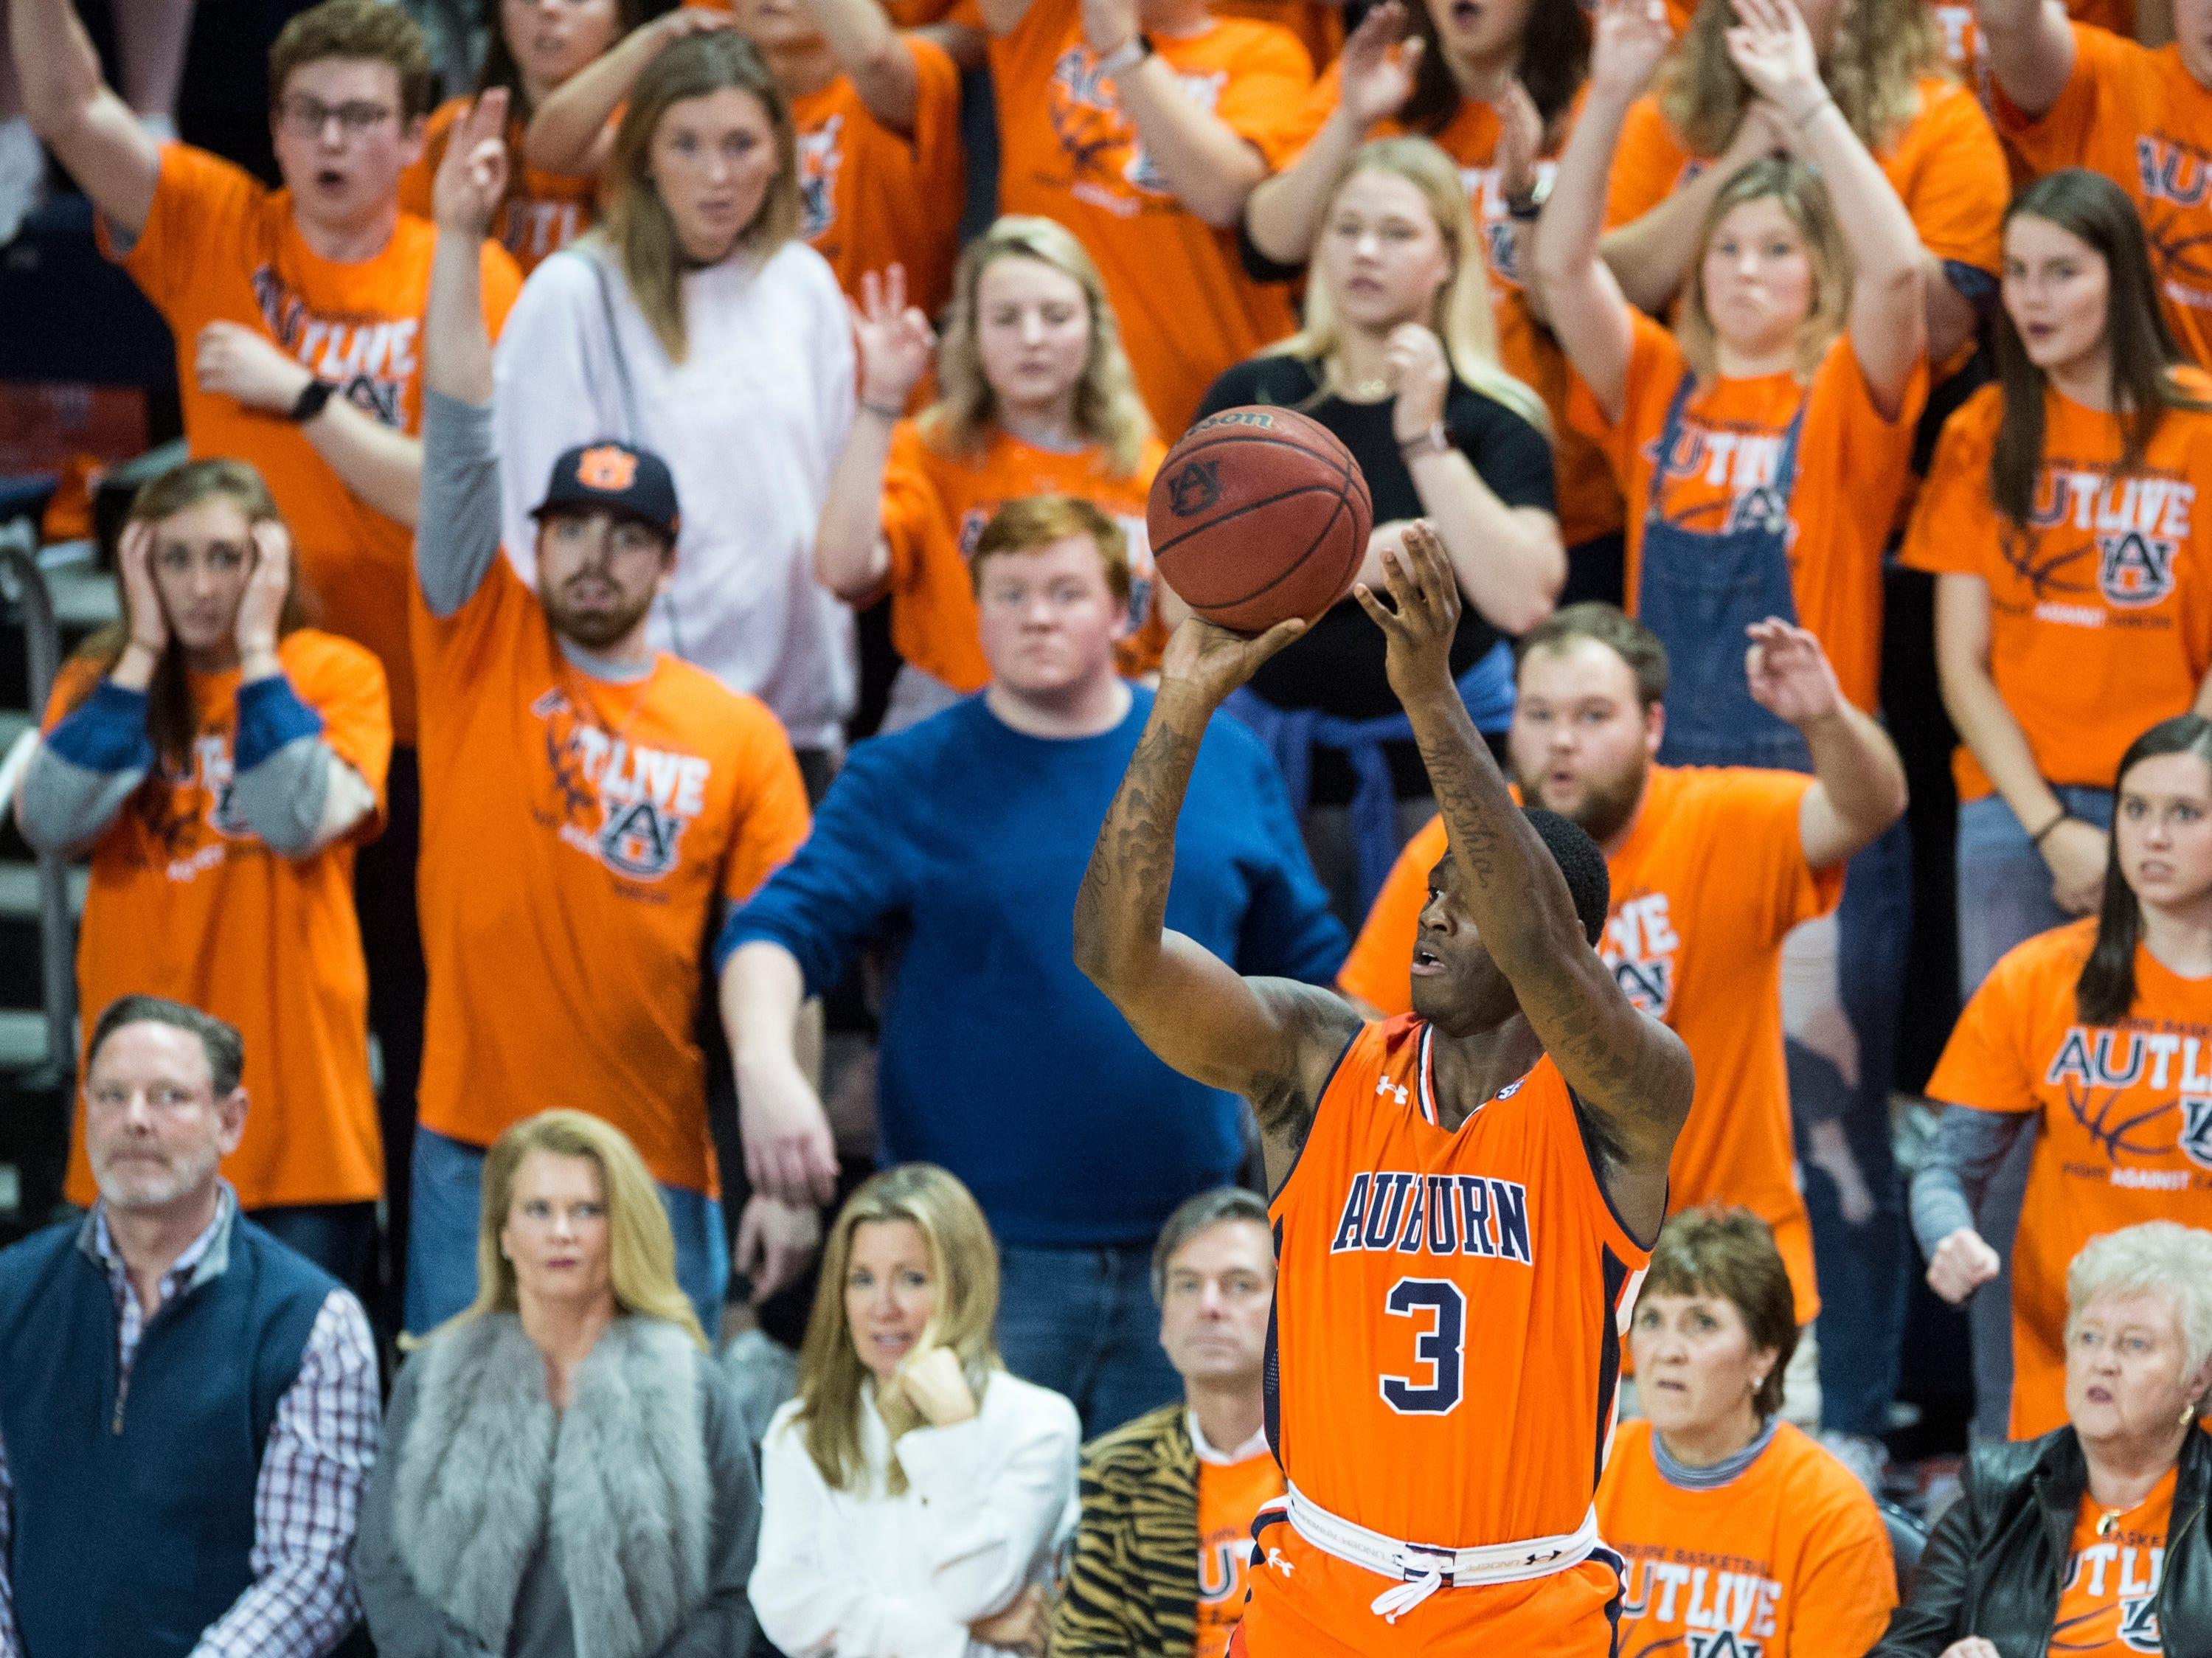 Auburn forward Danjel Purifoy (3) takes a three-pointer at Auburn Arena in Auburn, Ala., on Saturday, Feb. 2, 2019. Auburn defeated Alabama 84-63.